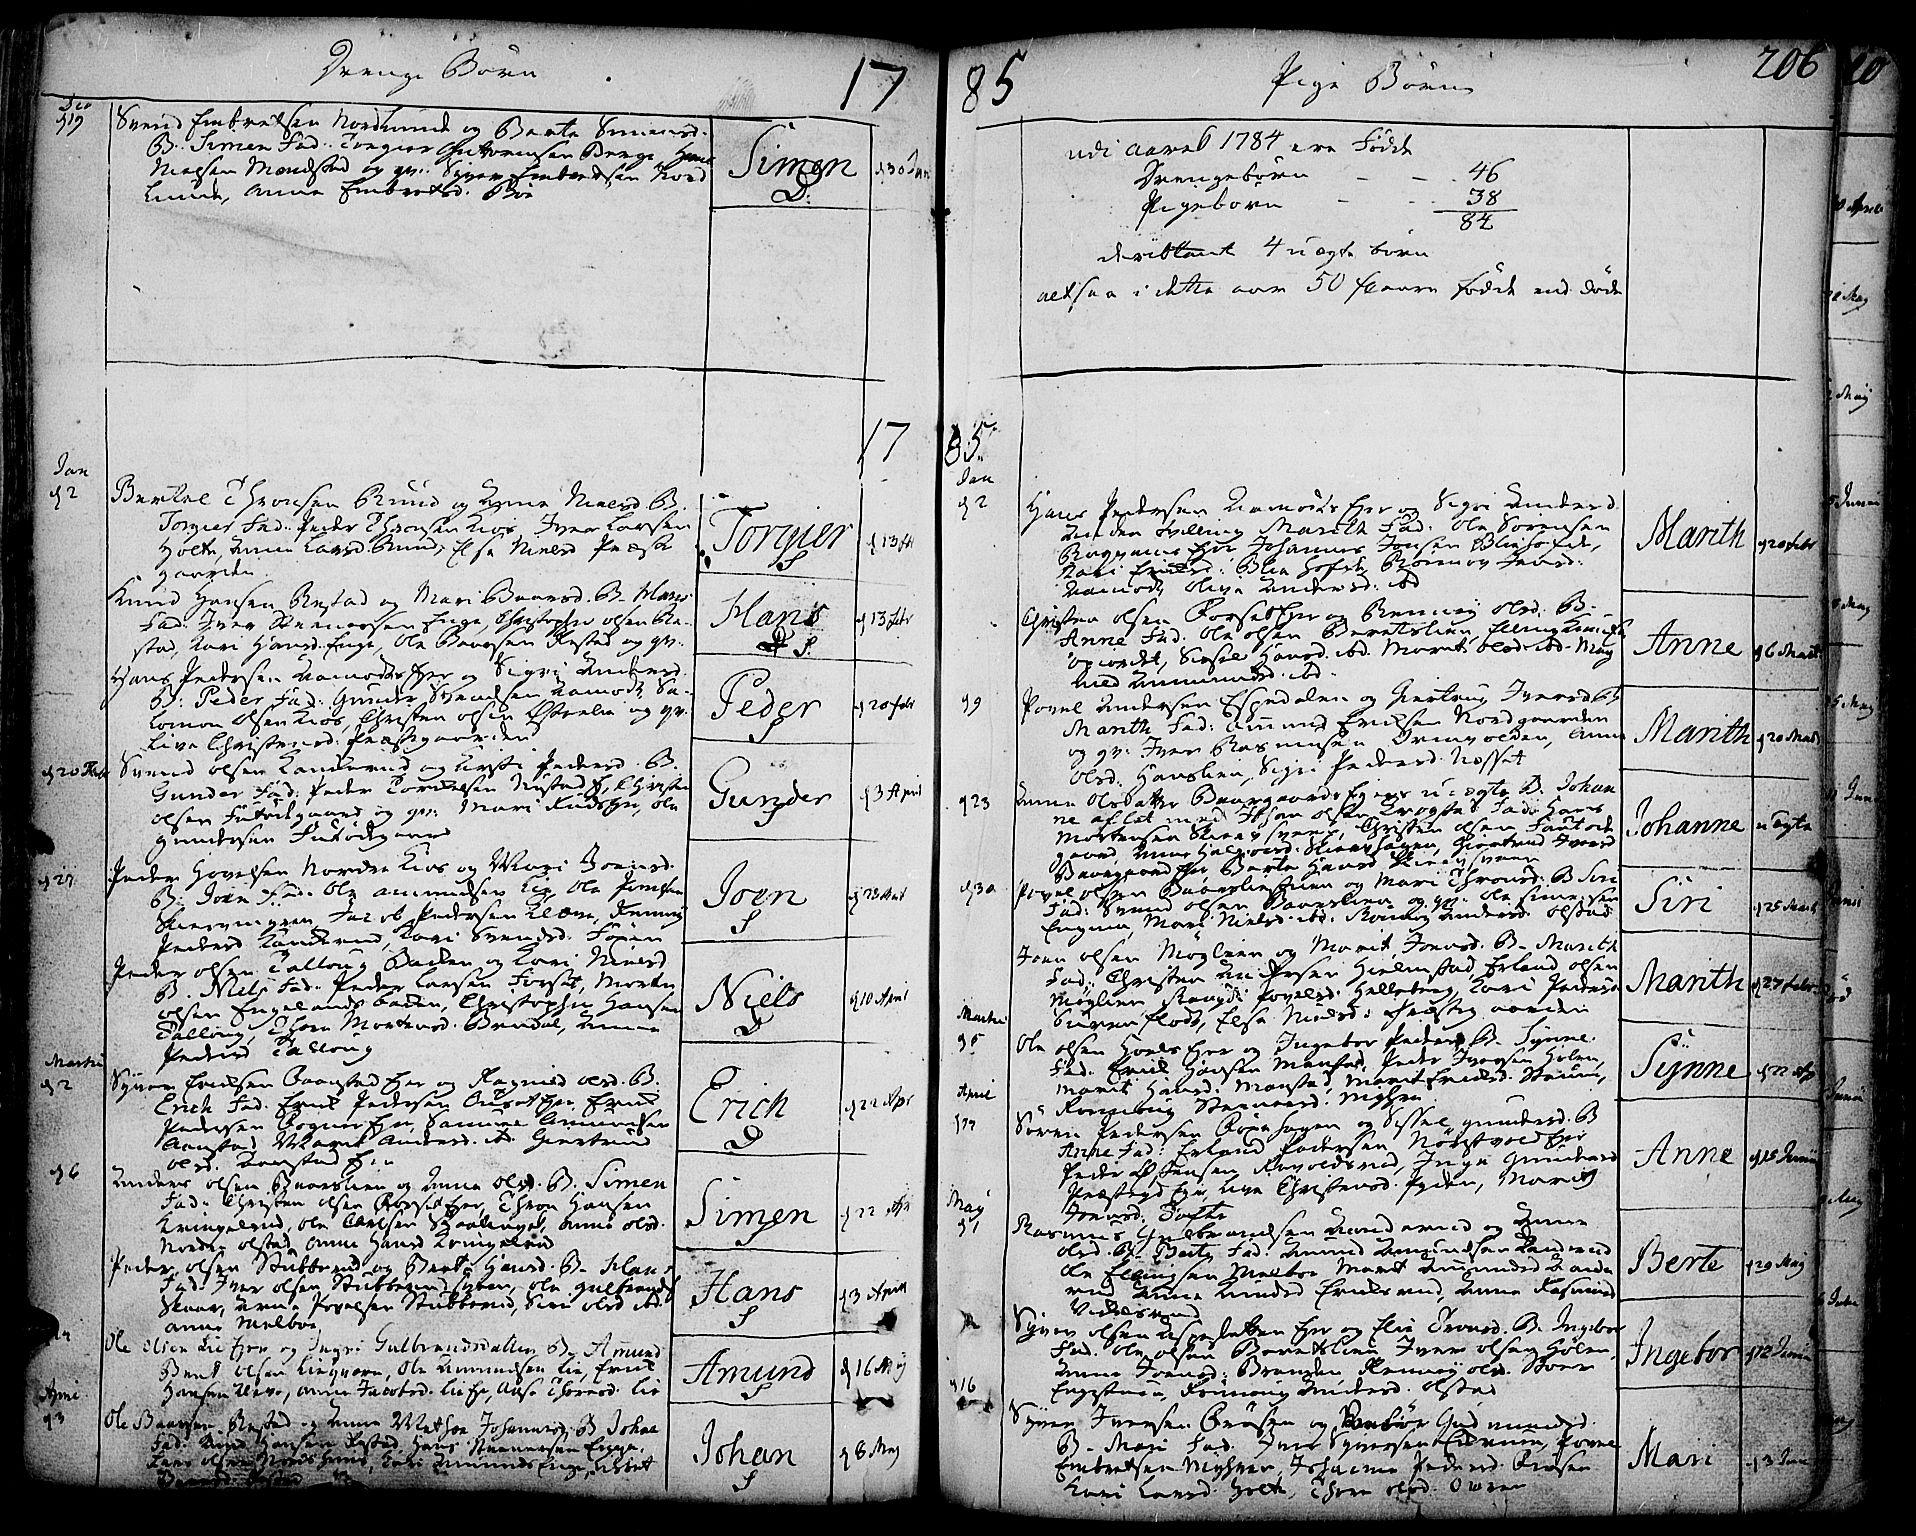 SAH, Gausdal prestekontor, Ministerialbok nr. 3, 1758-1809, s. 206